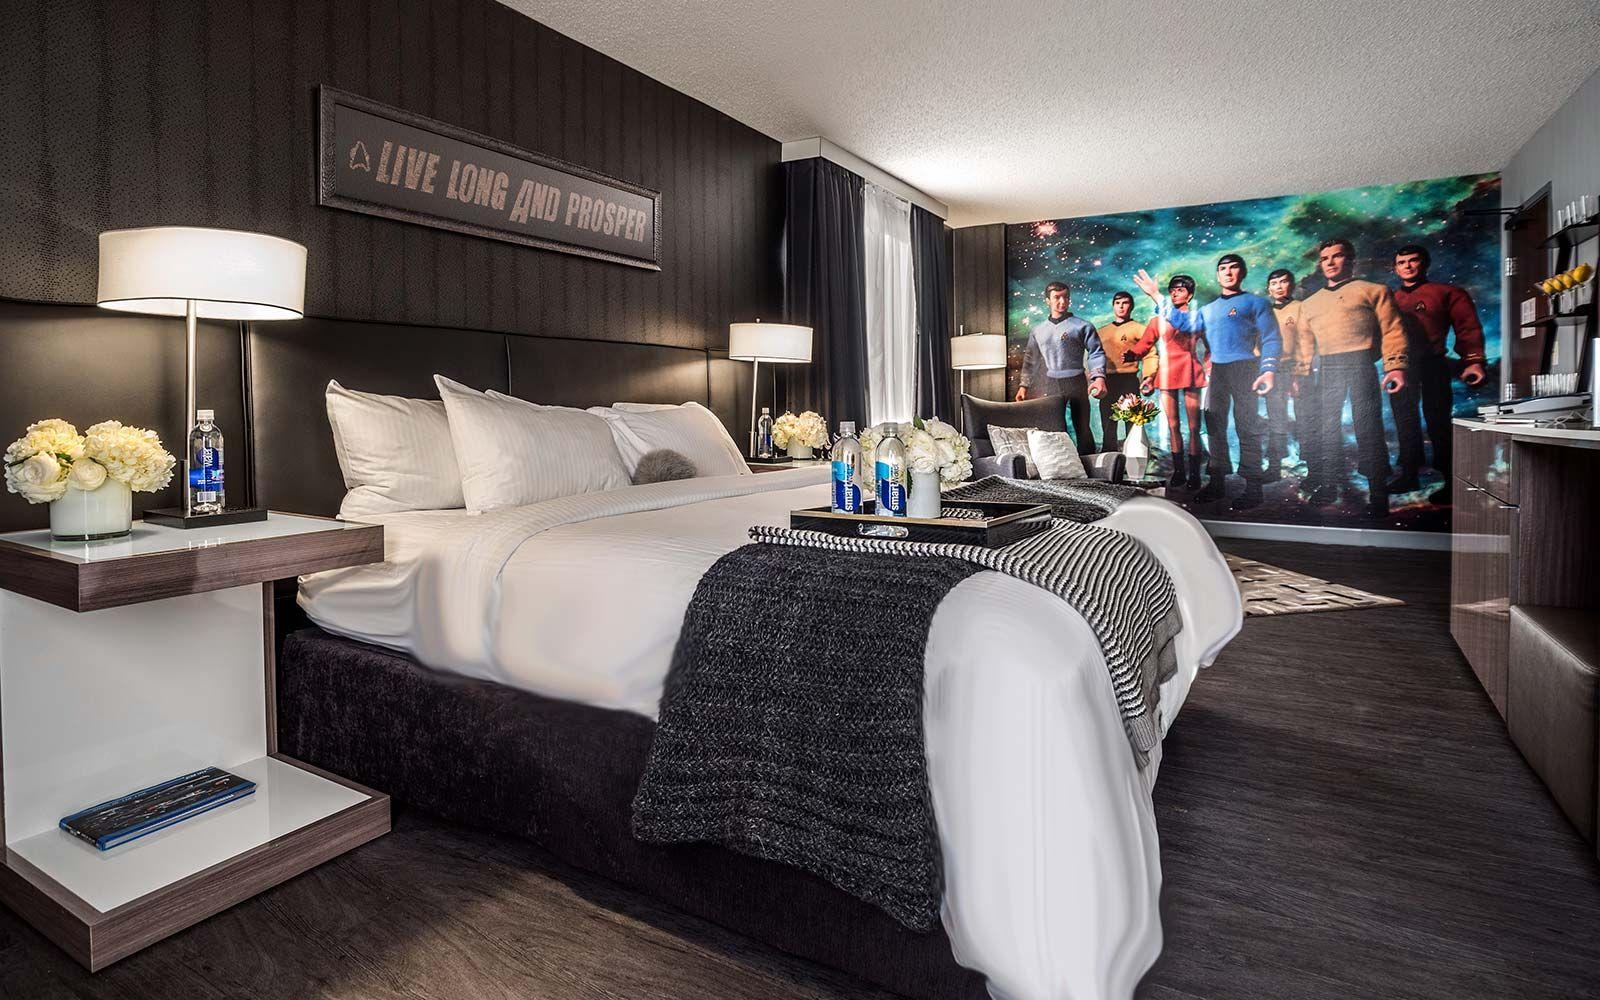 Movie Themed Hotels Star Trek Curtis Denver Amazing Hotels Rooms Hotel Themed Hotel Rooms